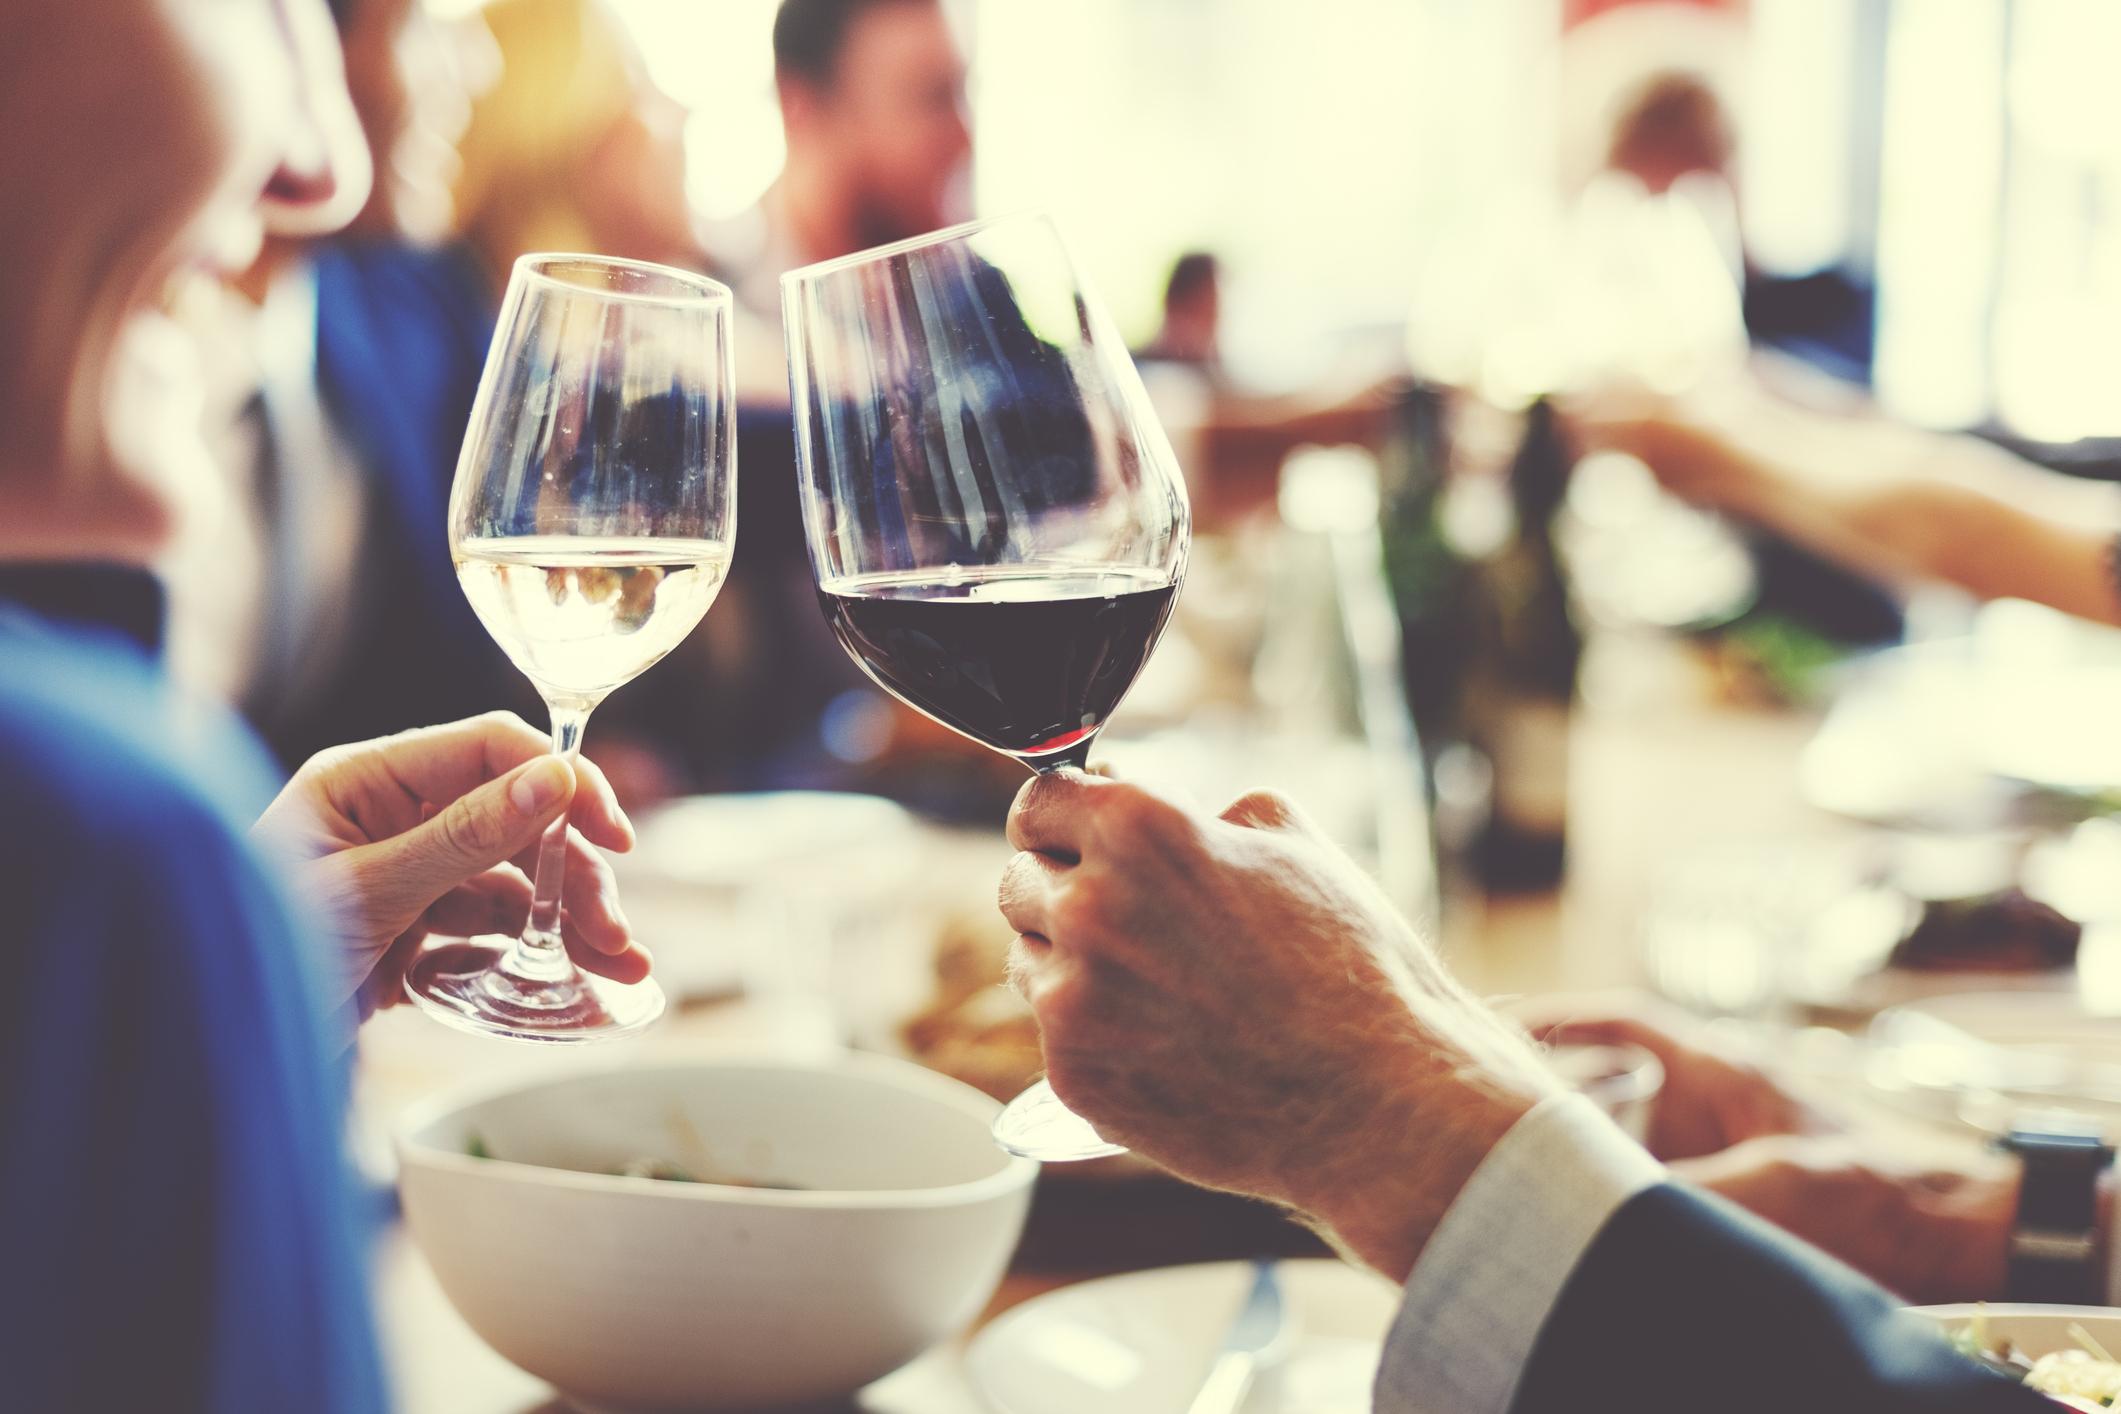 wine tasting evento enogastronomico